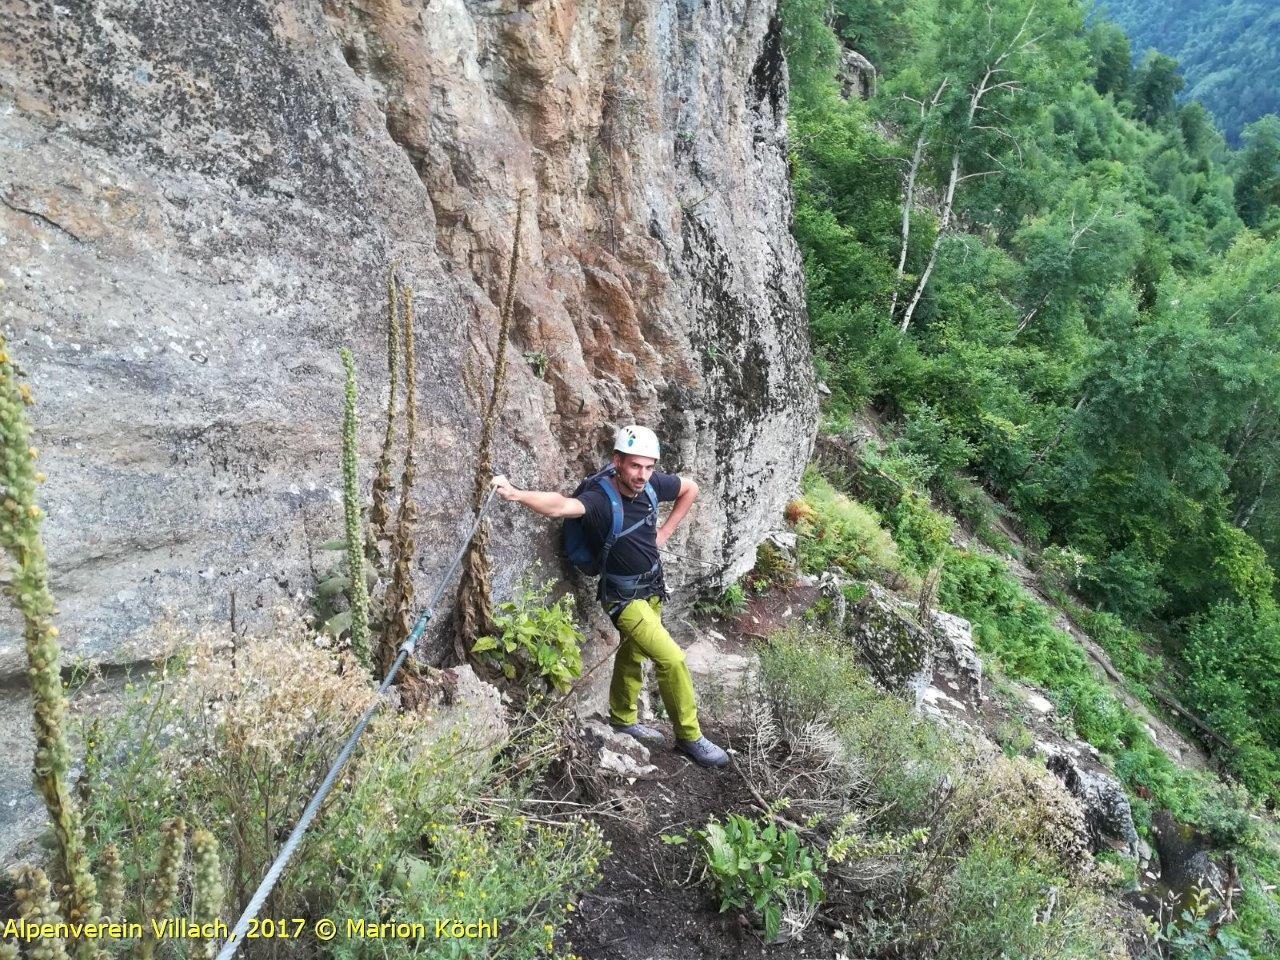 Klettersteig Villach : Oberkärntner jäger klettersteig döbriach alpenverein